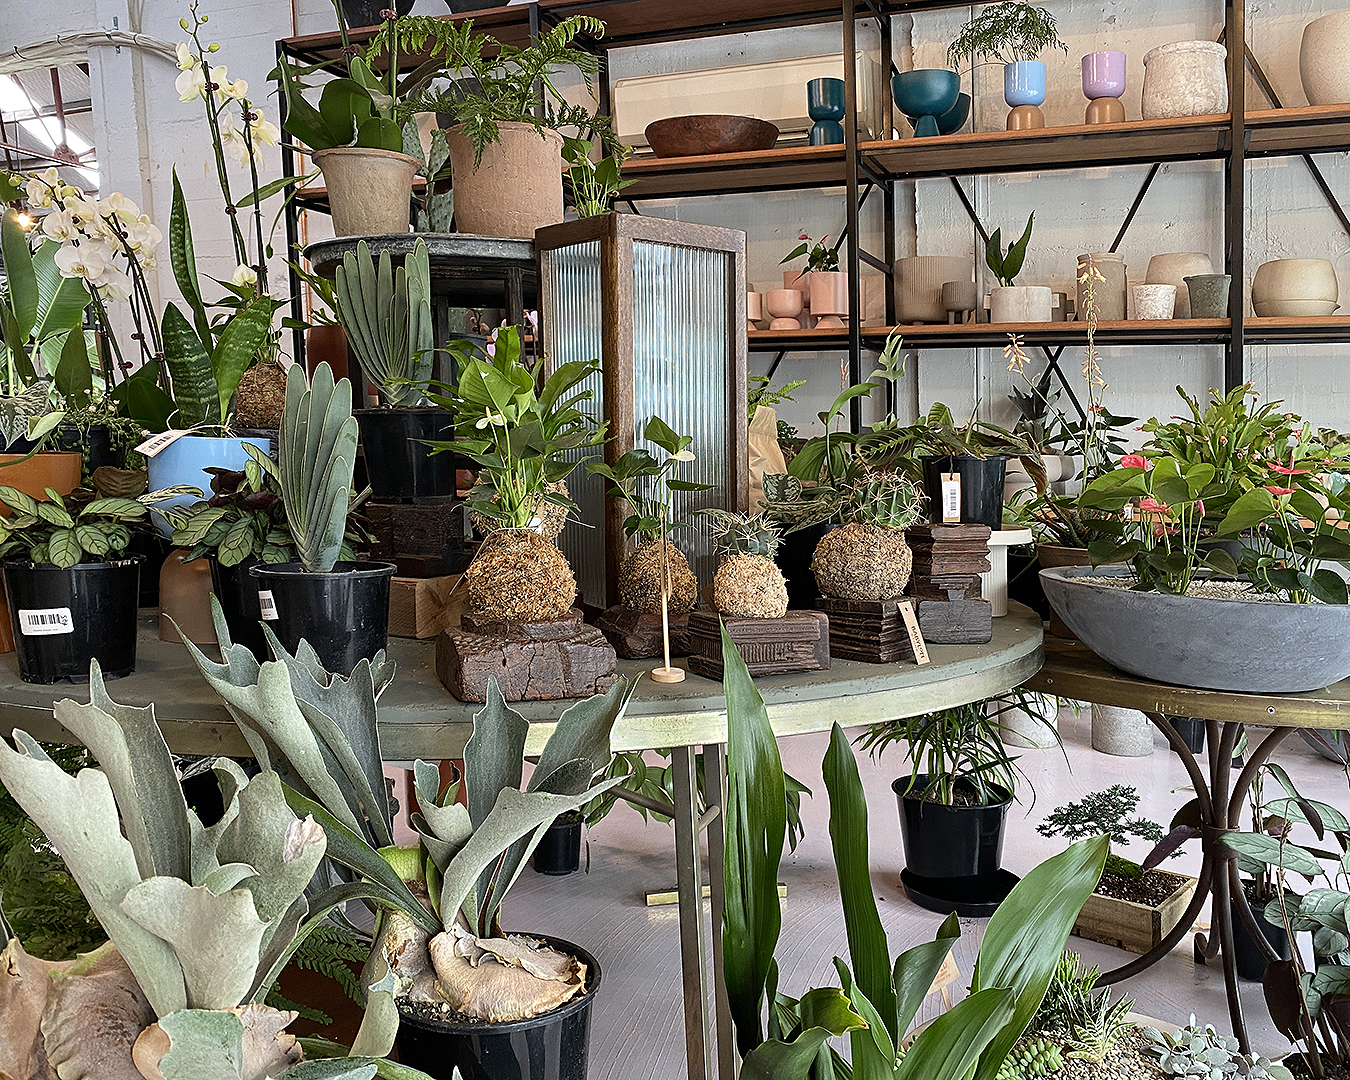 Plants galore at Babylon Store.